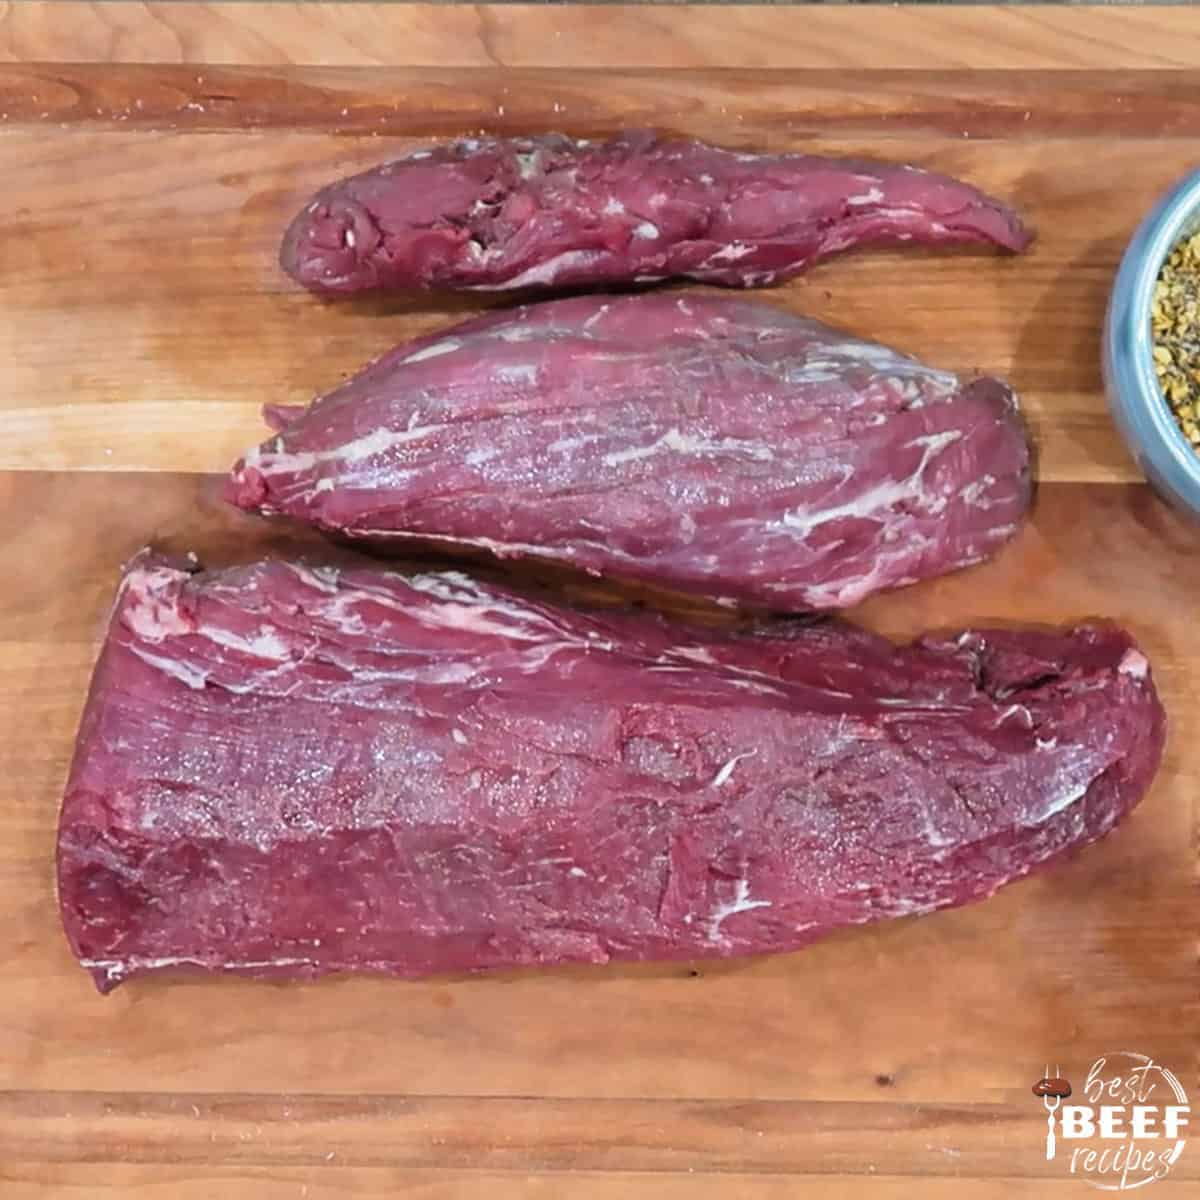 Trimmed beef tenderloin on a cutting board